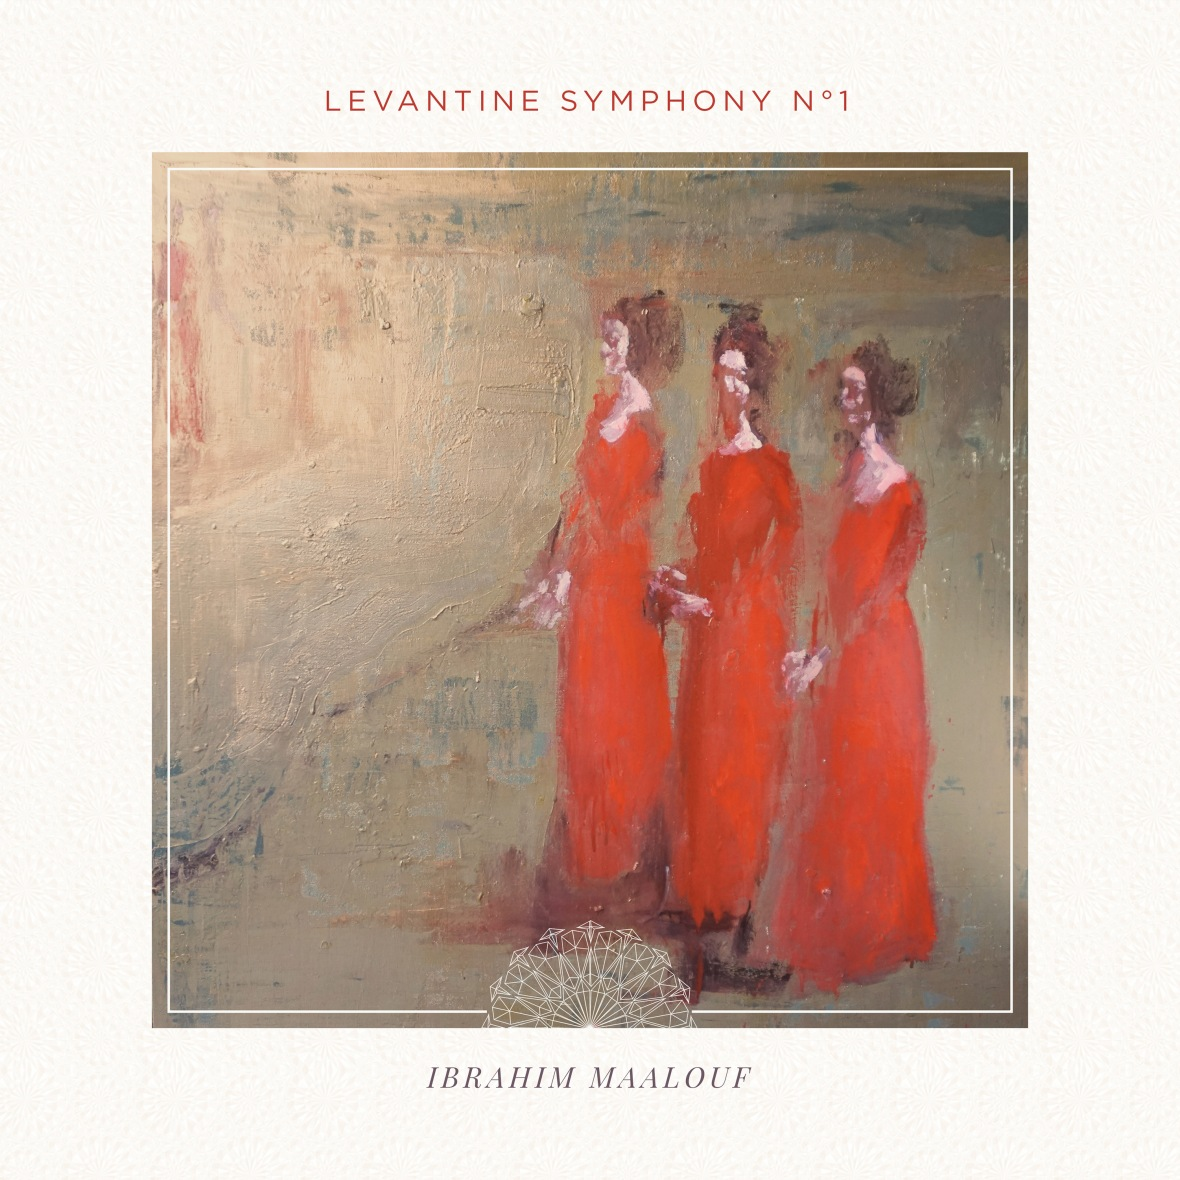 Ibrahim Maalouf - Levantine Symphony No.1